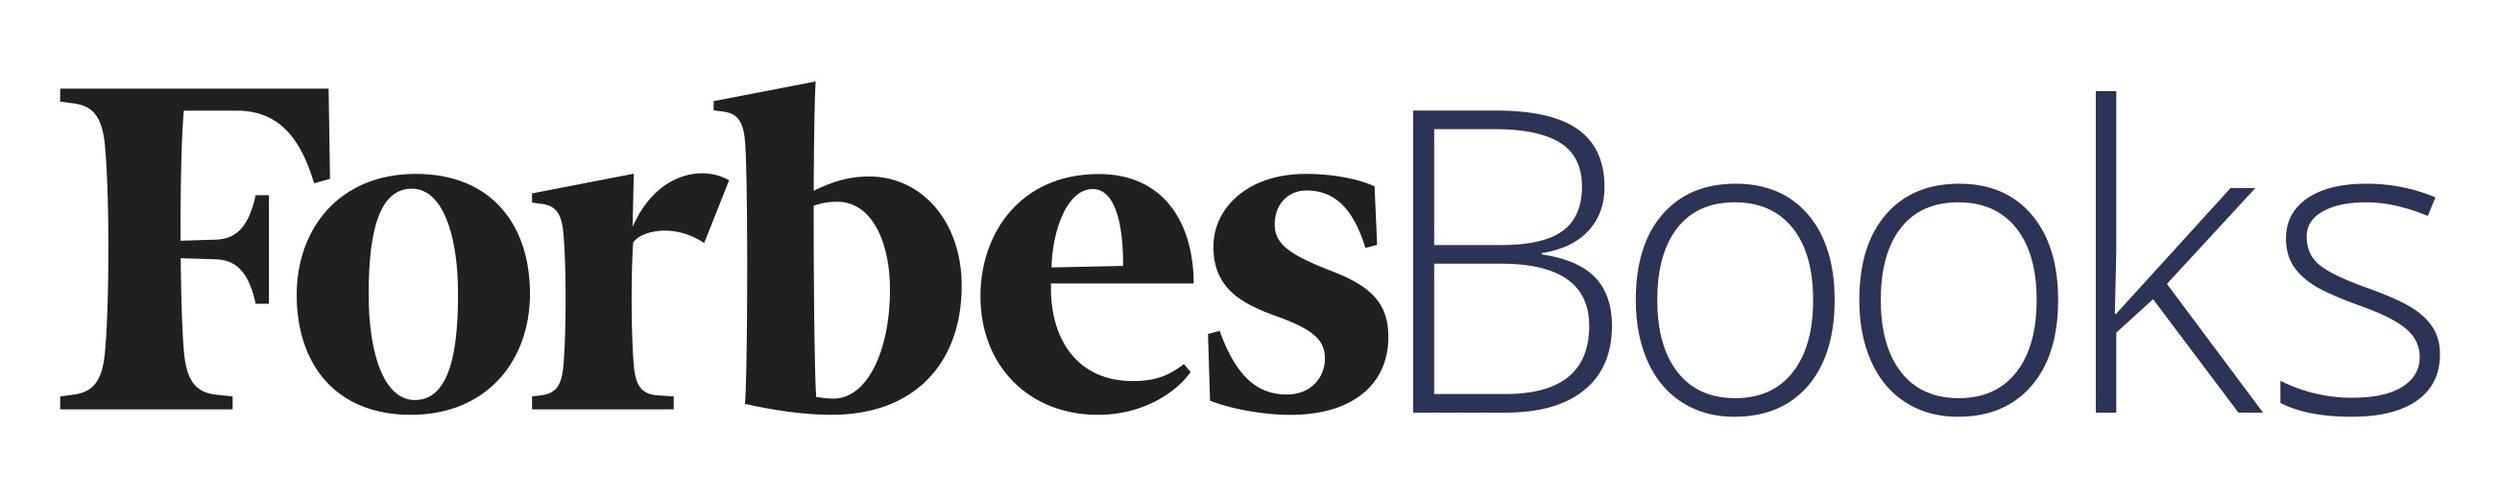 forbes books logo